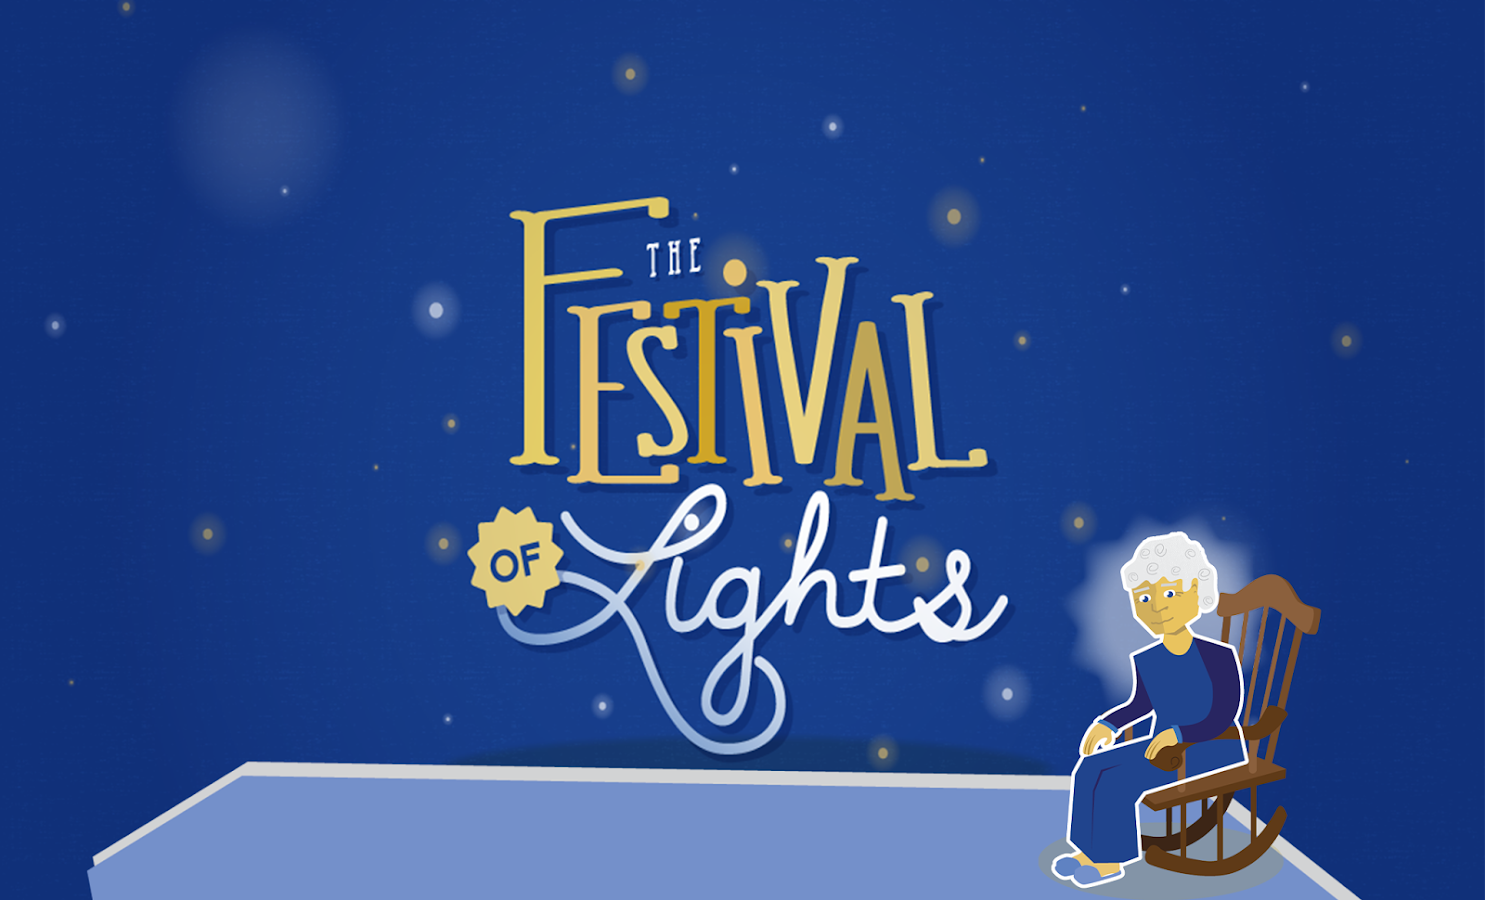 Uncategorized Hanukkah Festival Of Lights Song hanukkah festival of lights android apps on google play screenshot